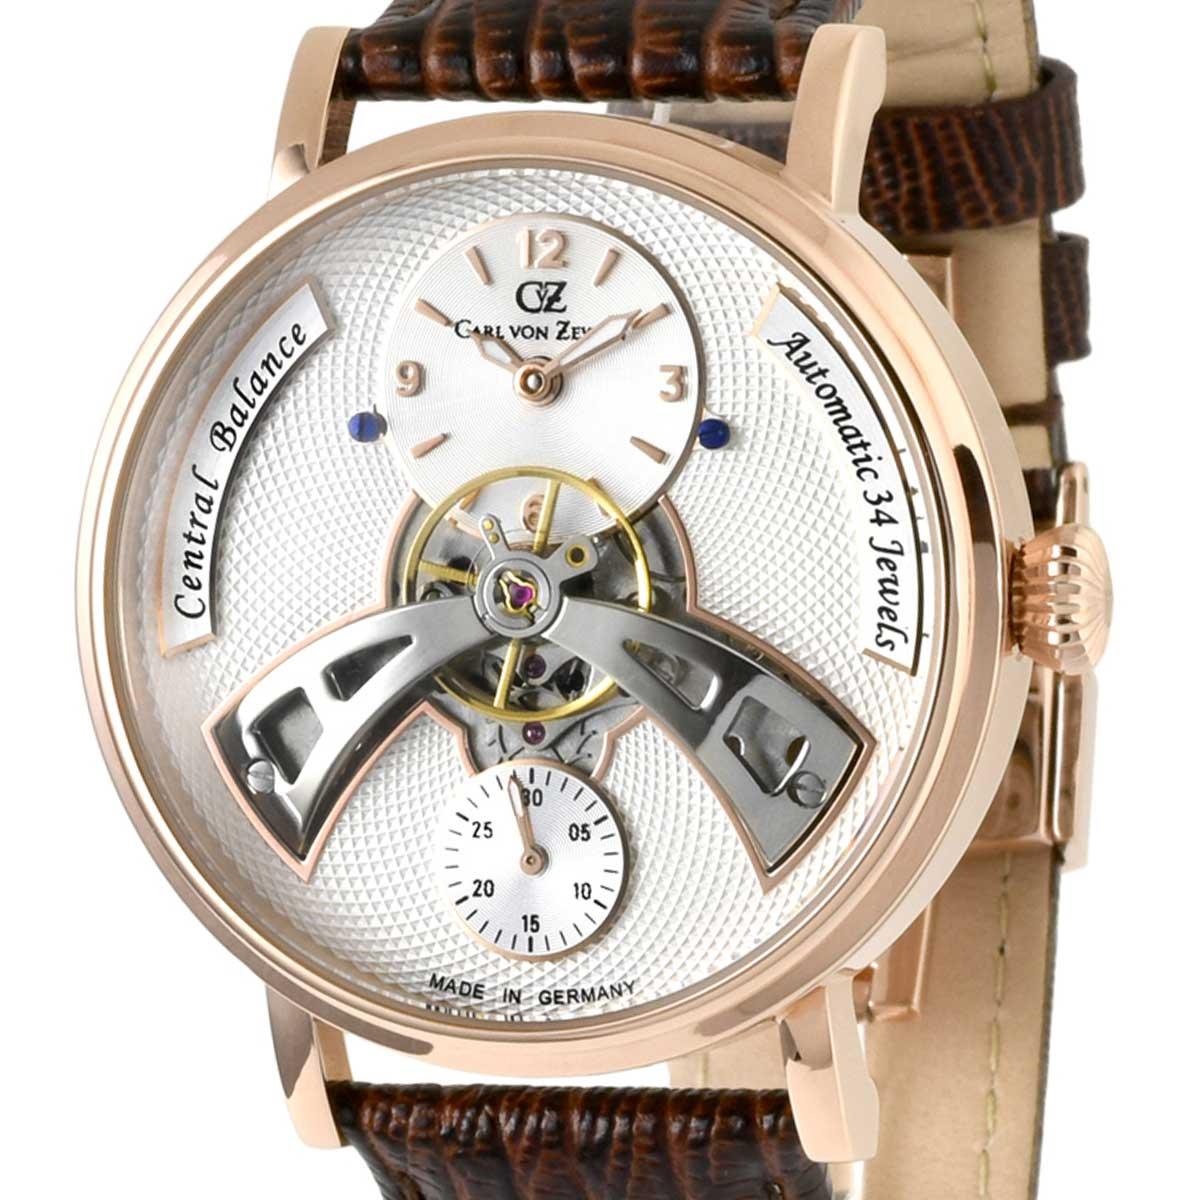 Carl von Zeyten カール・フォン・ツォイテン 自動巻き(手巻き機能あり) 腕時計 [CvZ0042RWH] 正規代理店品